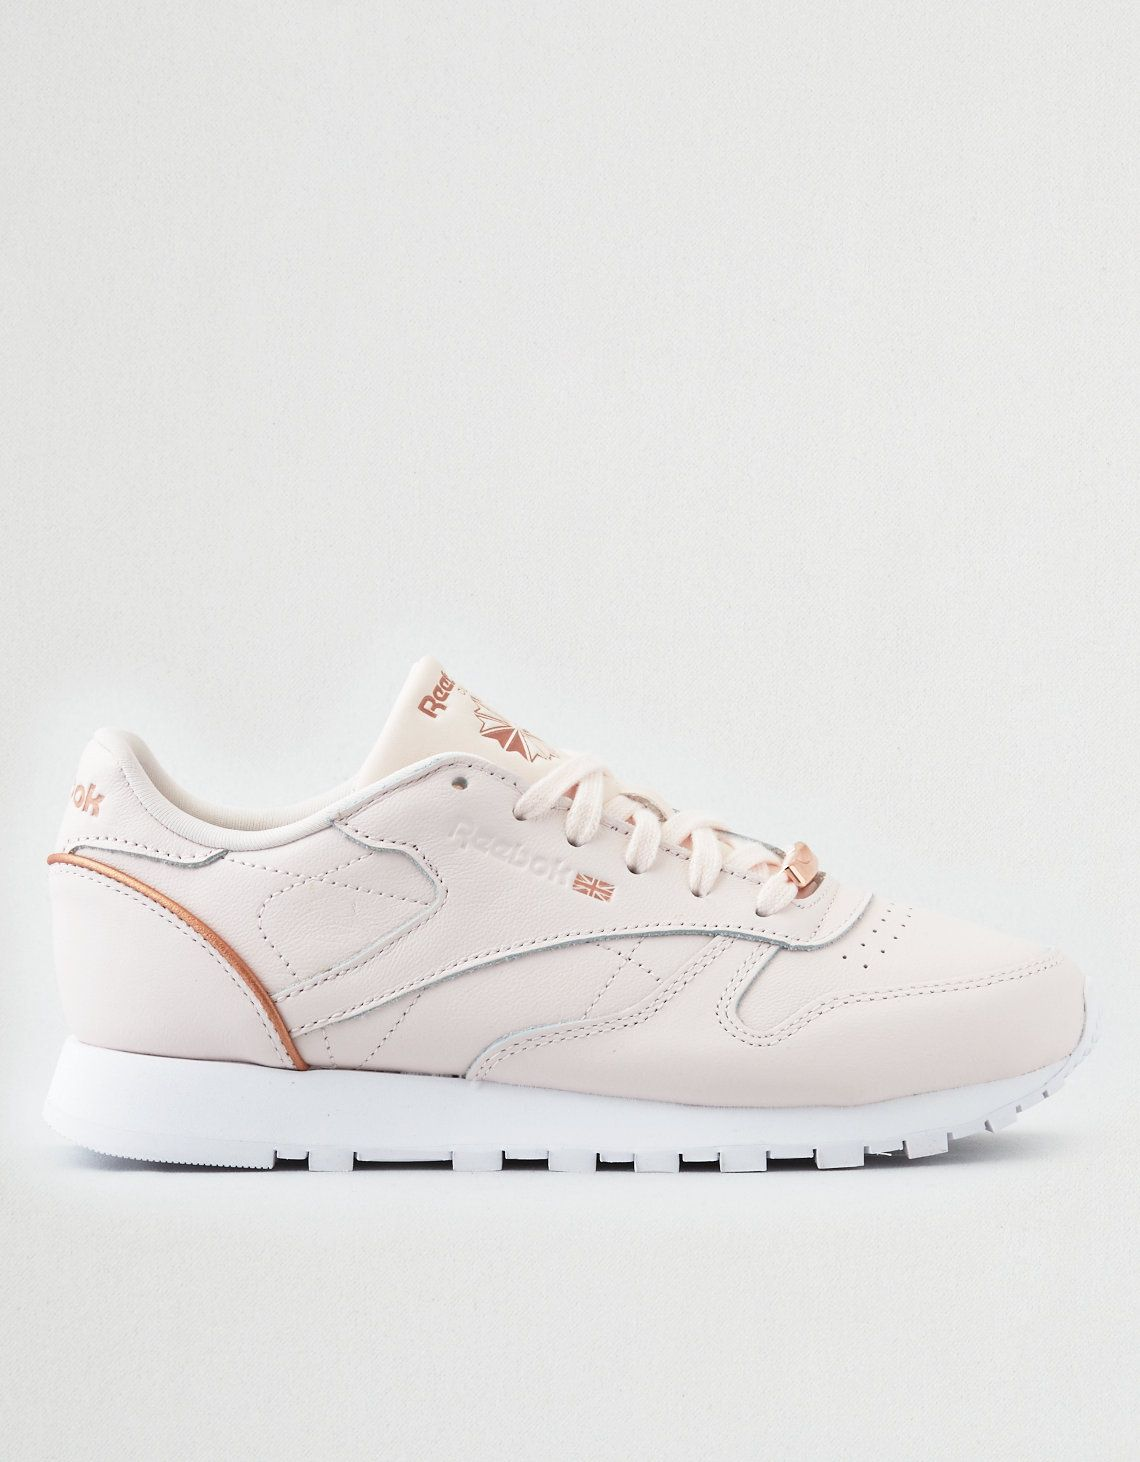 Reebok Classic Leather HW Sneaker -  80.00   New Shoes   Pinterest ... d087b095b974